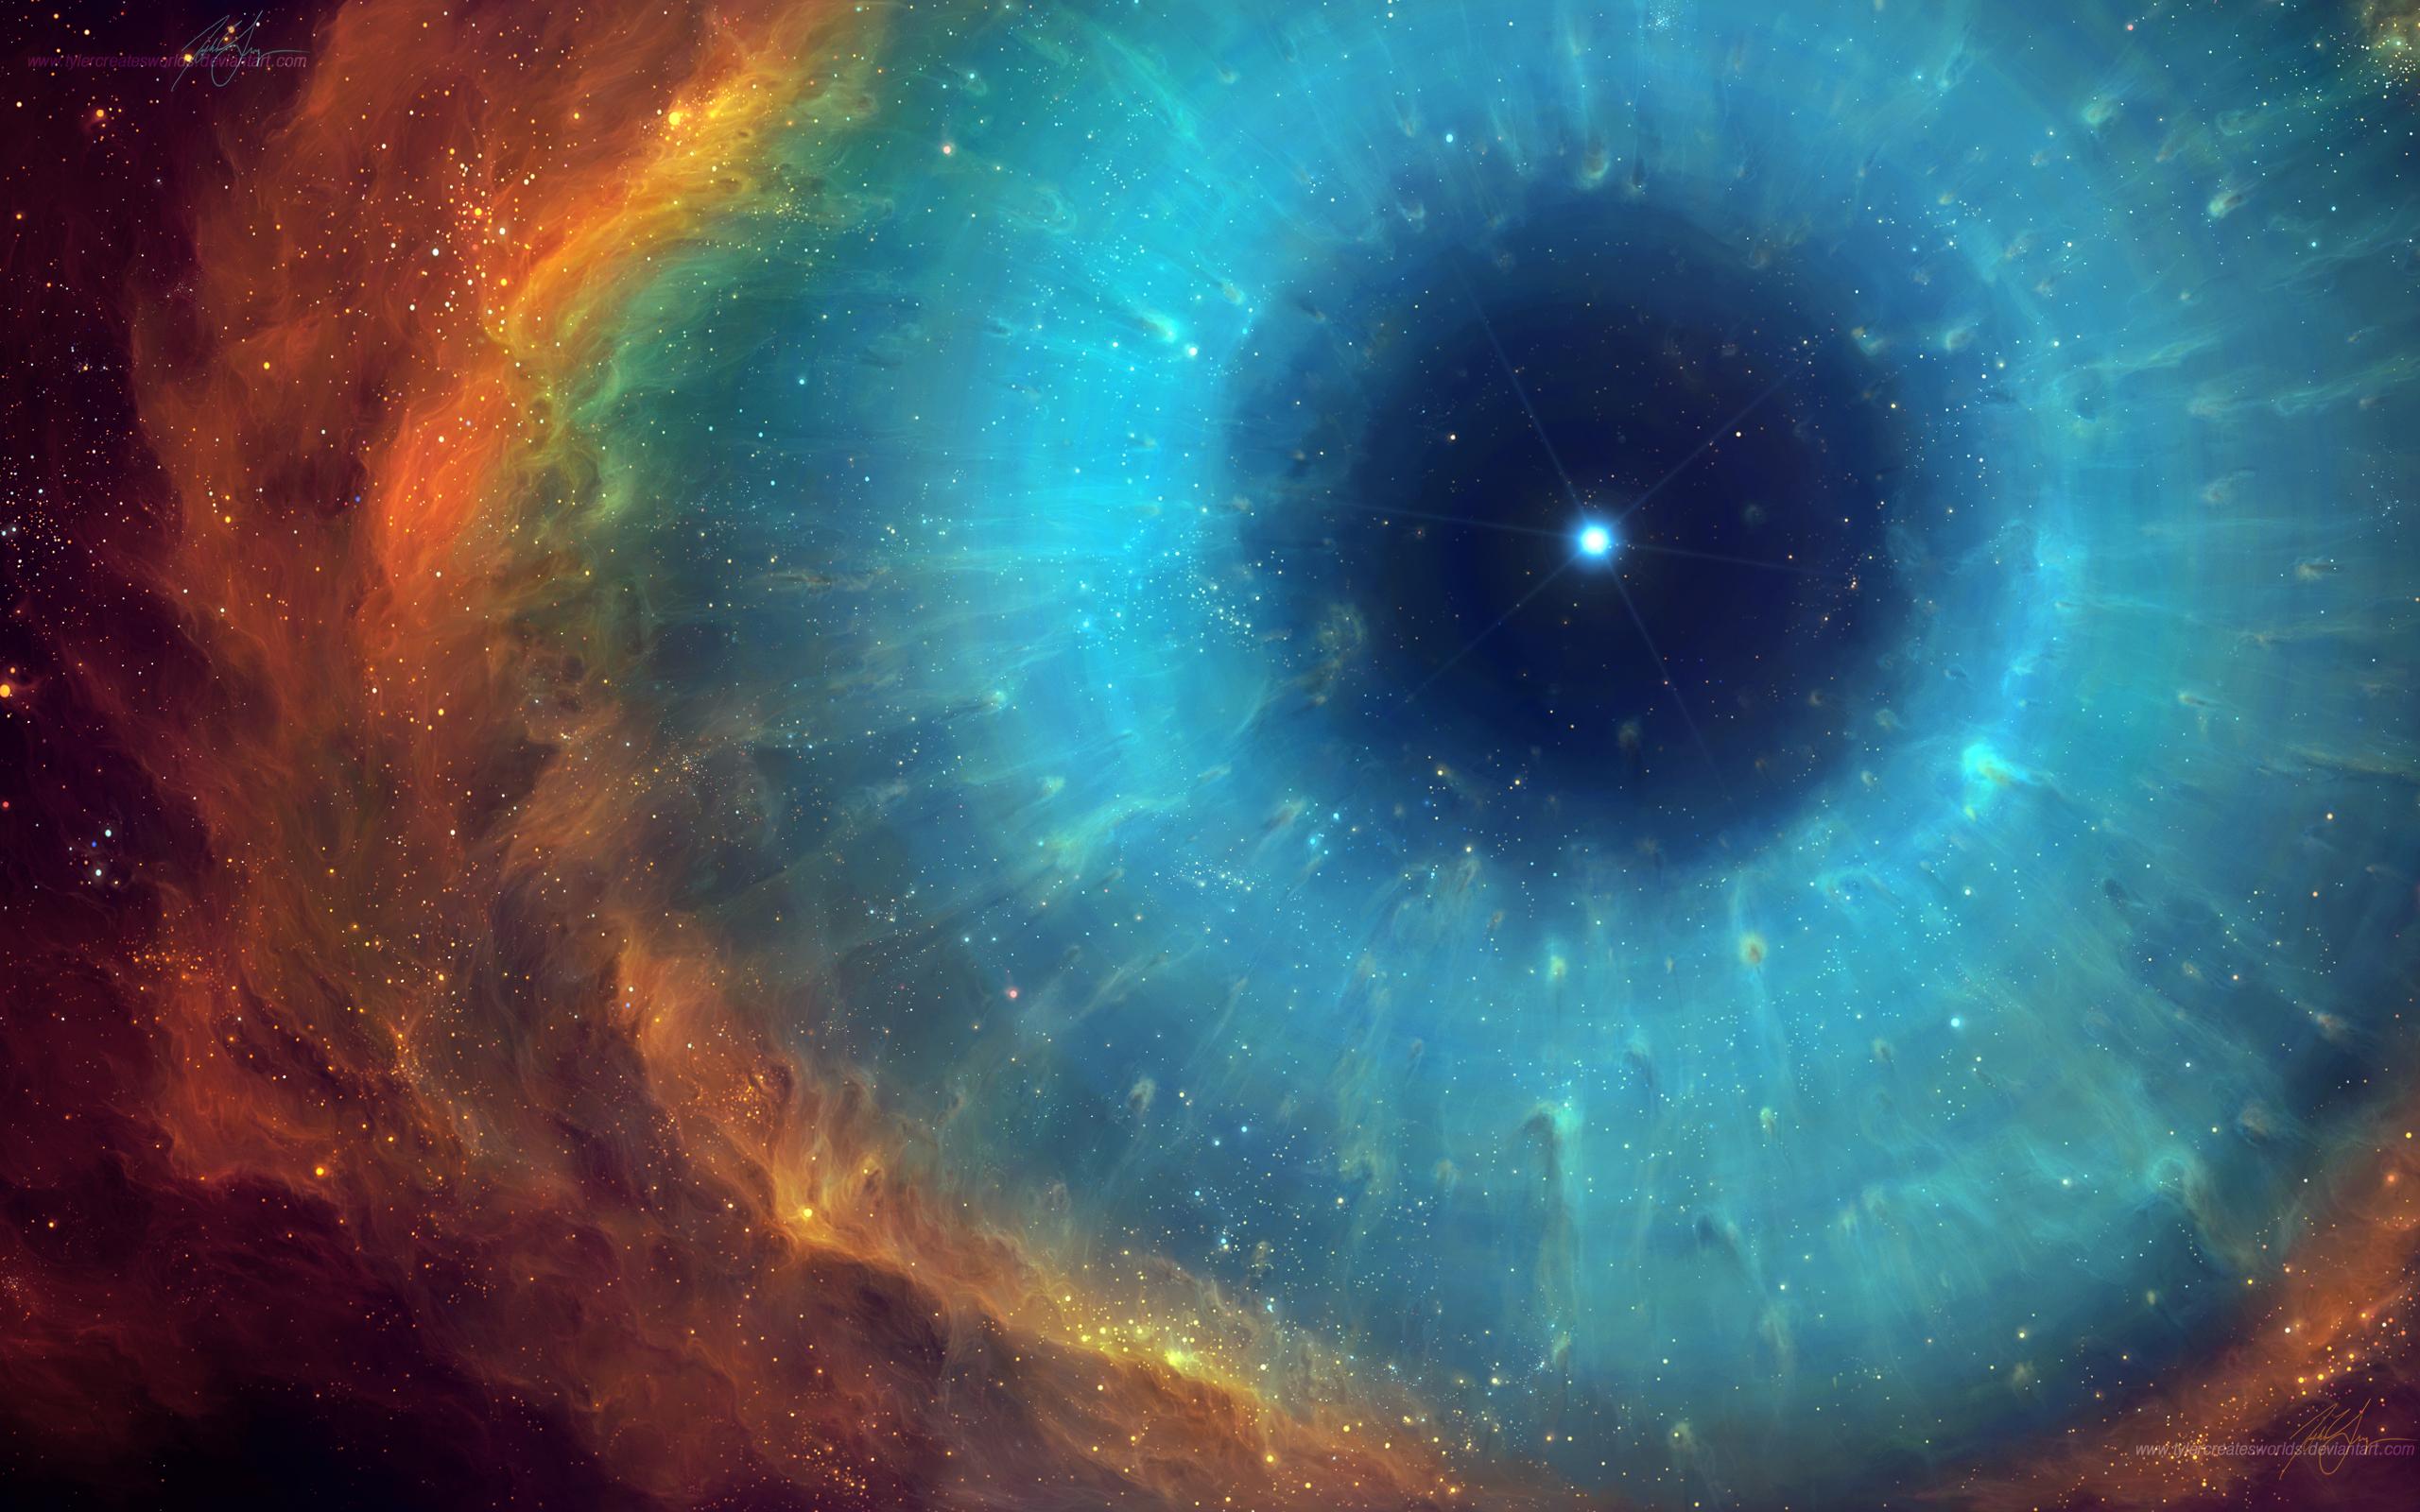 Supernova Stars Explosion Blue wallpaper 2560x1600 70802 2560x1600